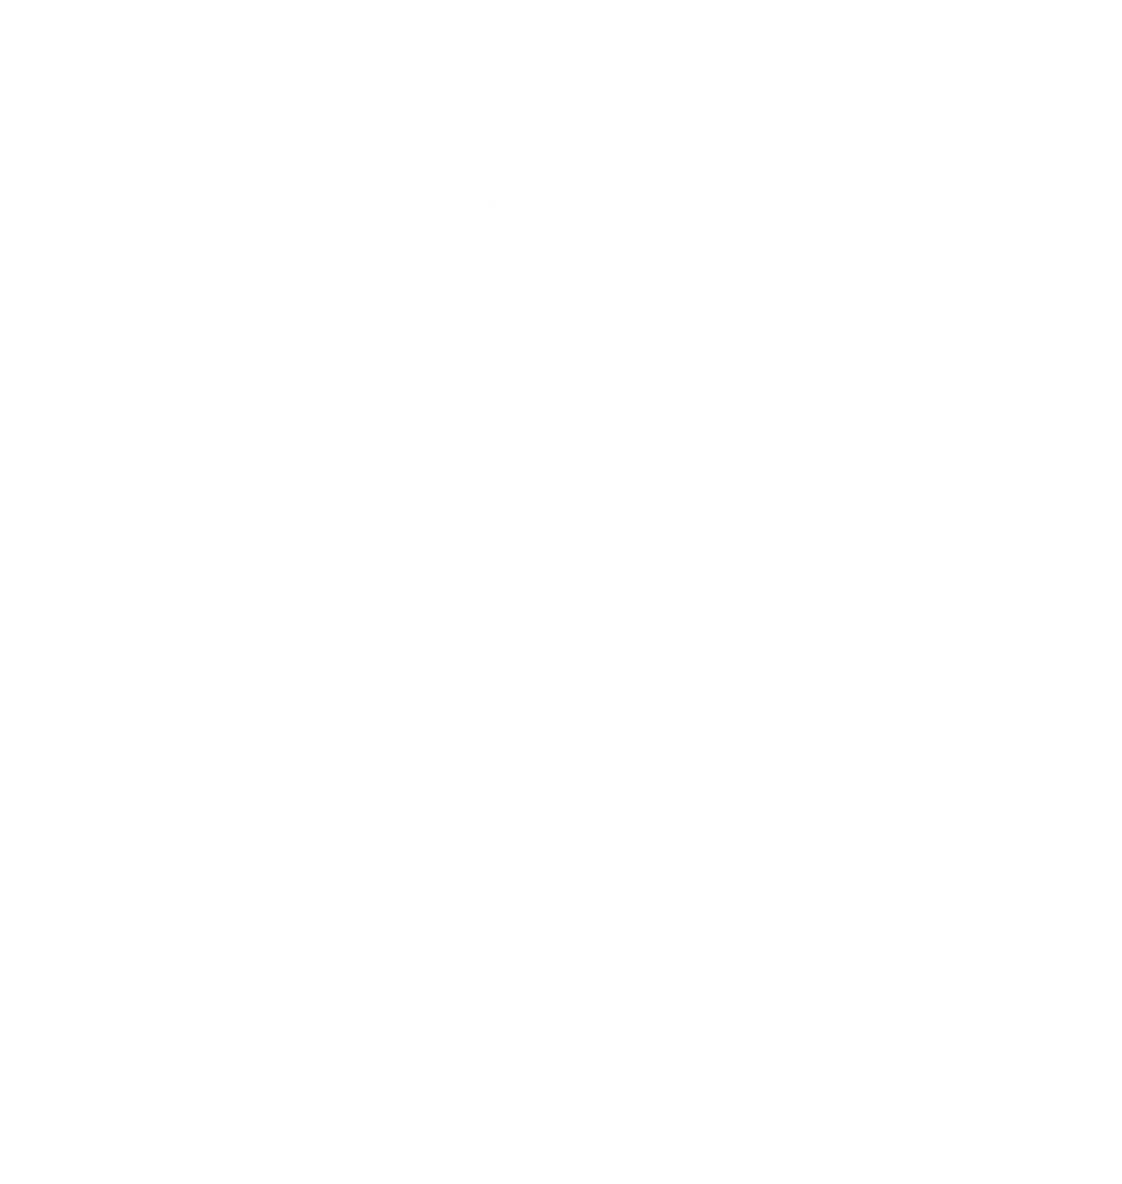 Hilborn Digital logo white